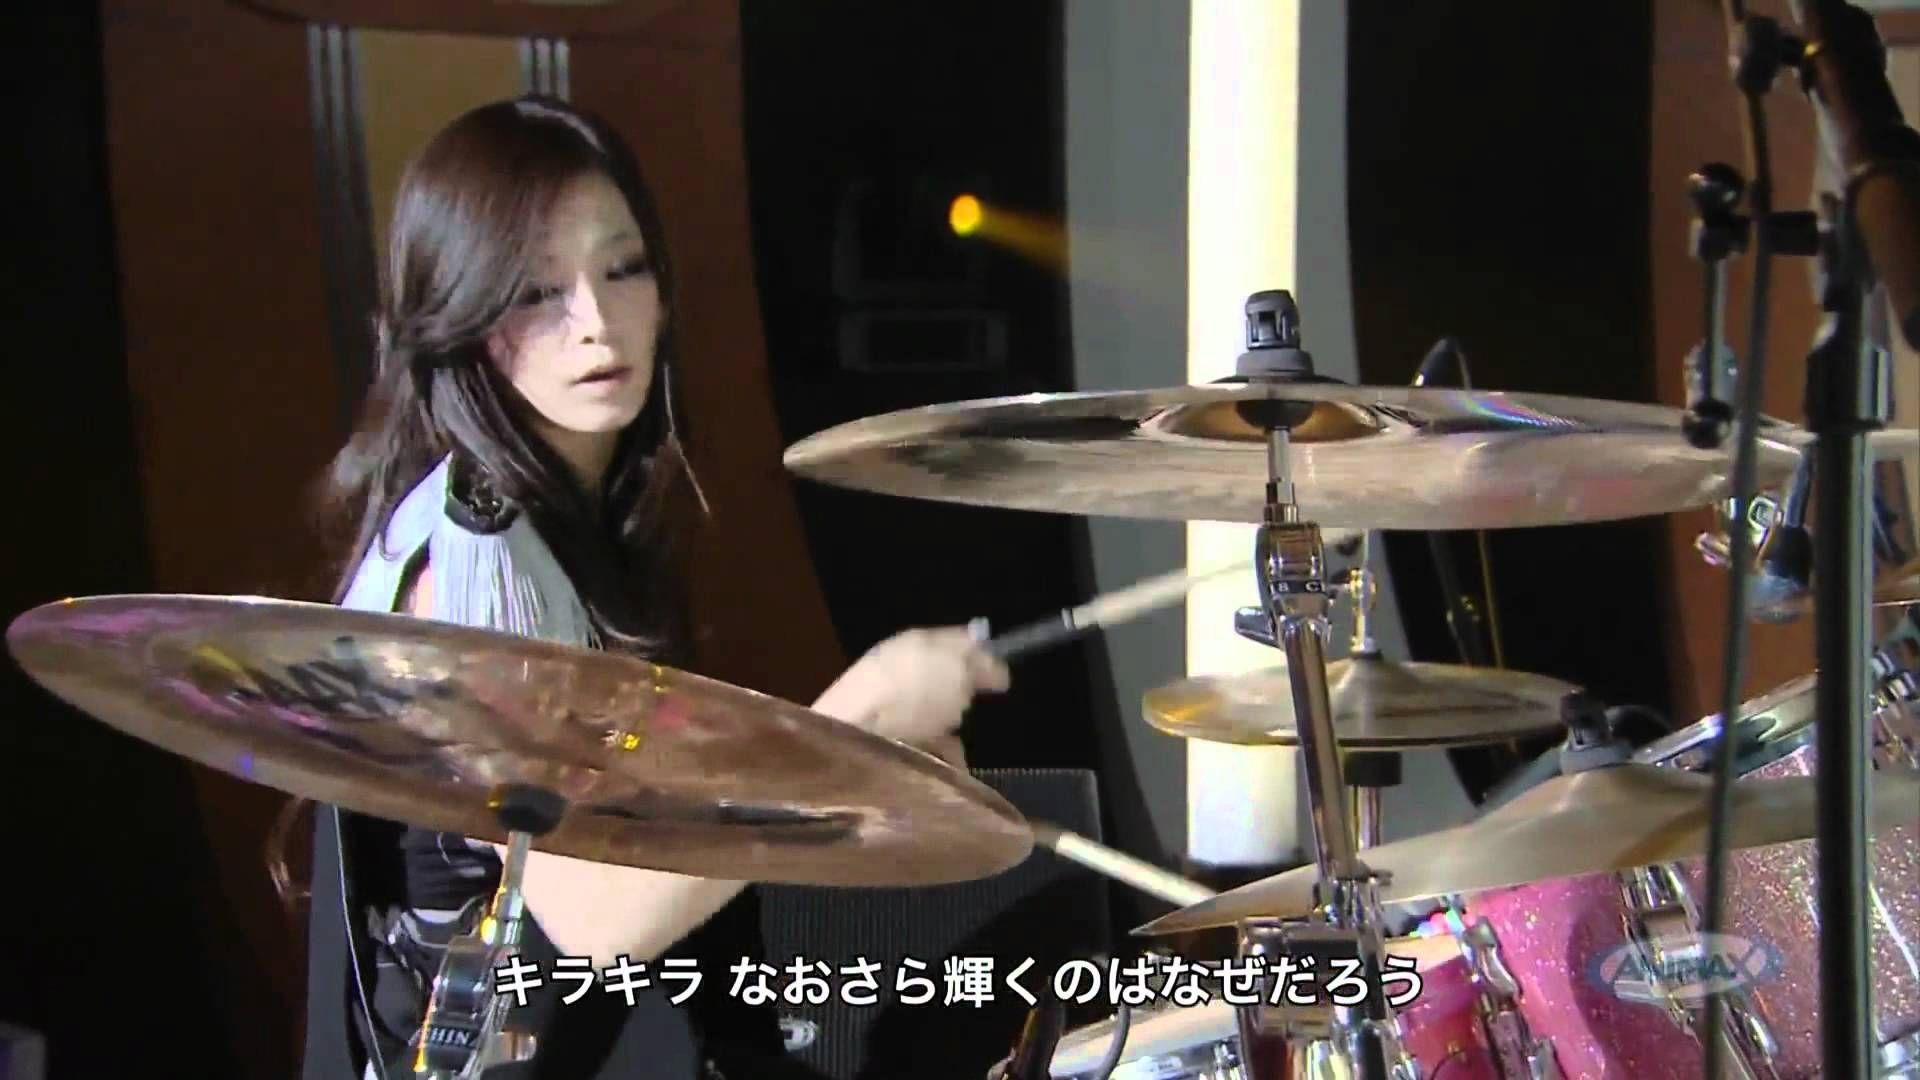 Scandal 瞬間センチメンタル At Studio Live Musica